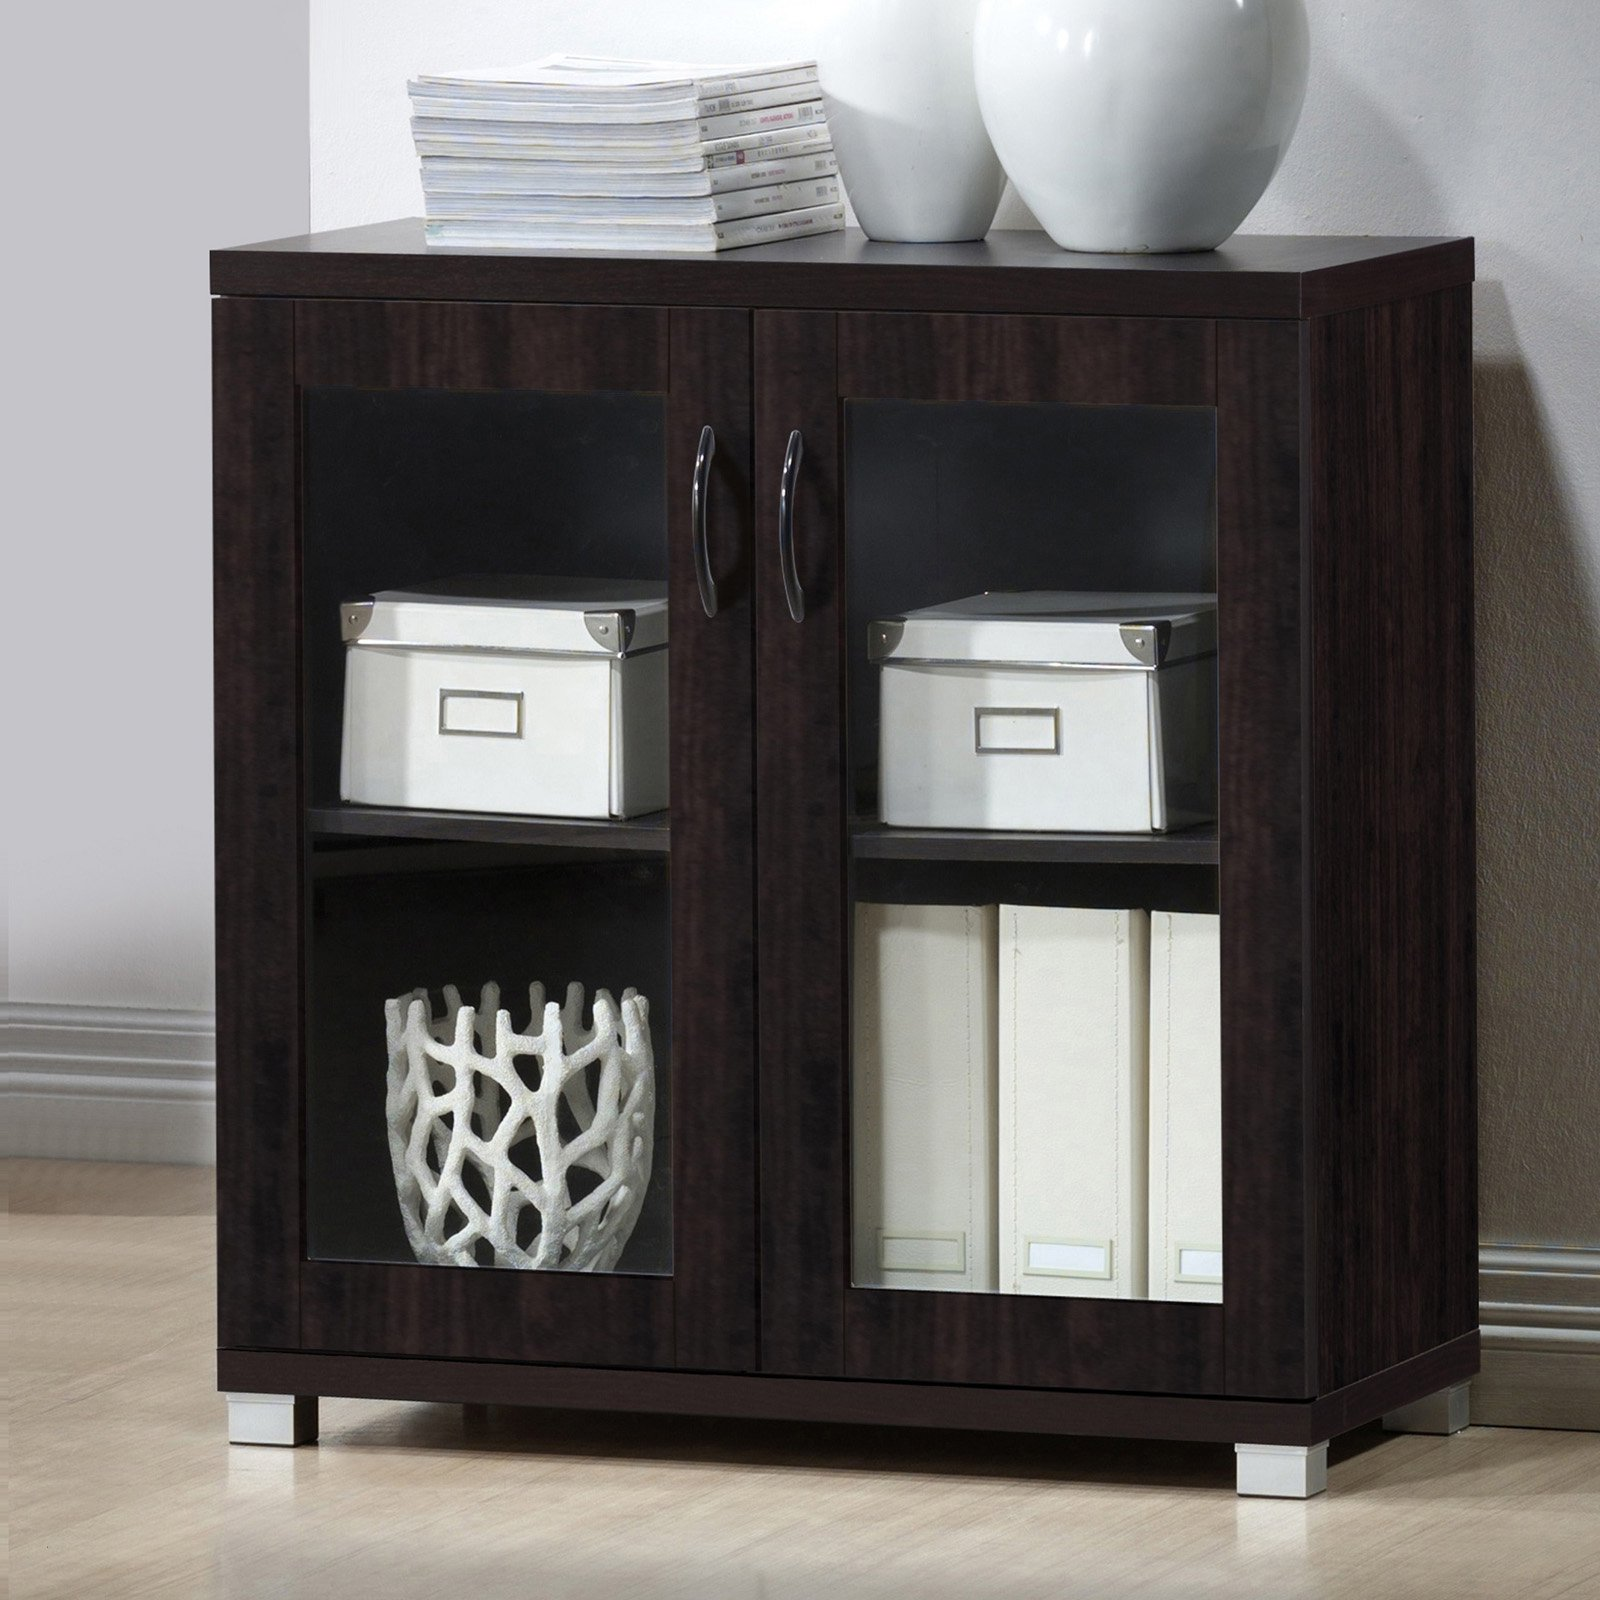 Baxton Studio Zentra Modern and Contemporary Dark Brown Sideboard Storage Cabinet with Glass Doors